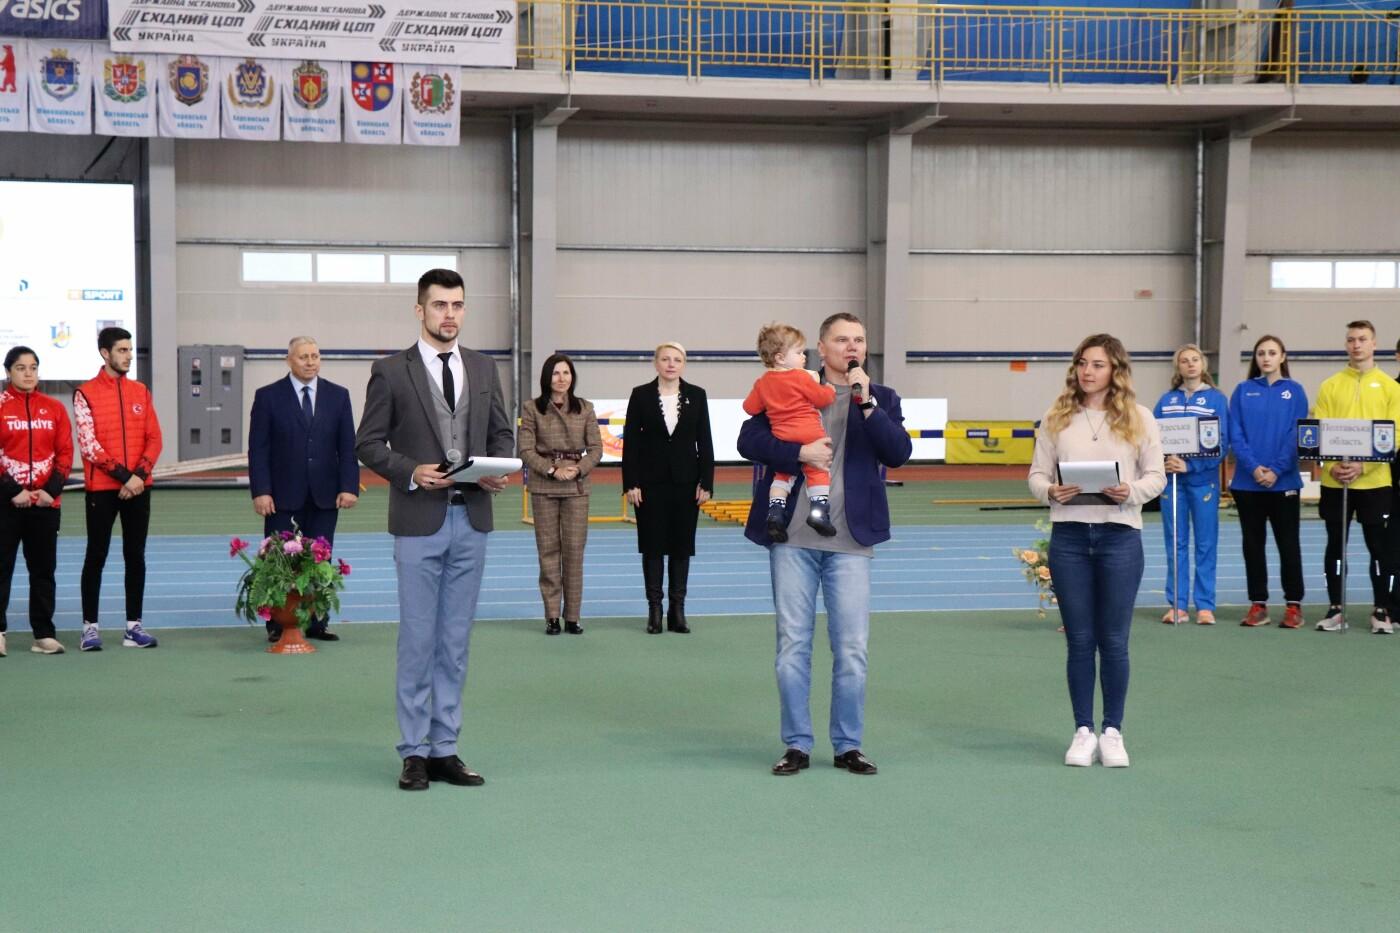 У Сумах змагаються легкоатлети України, Казахстану та Киргизстану, фото-5